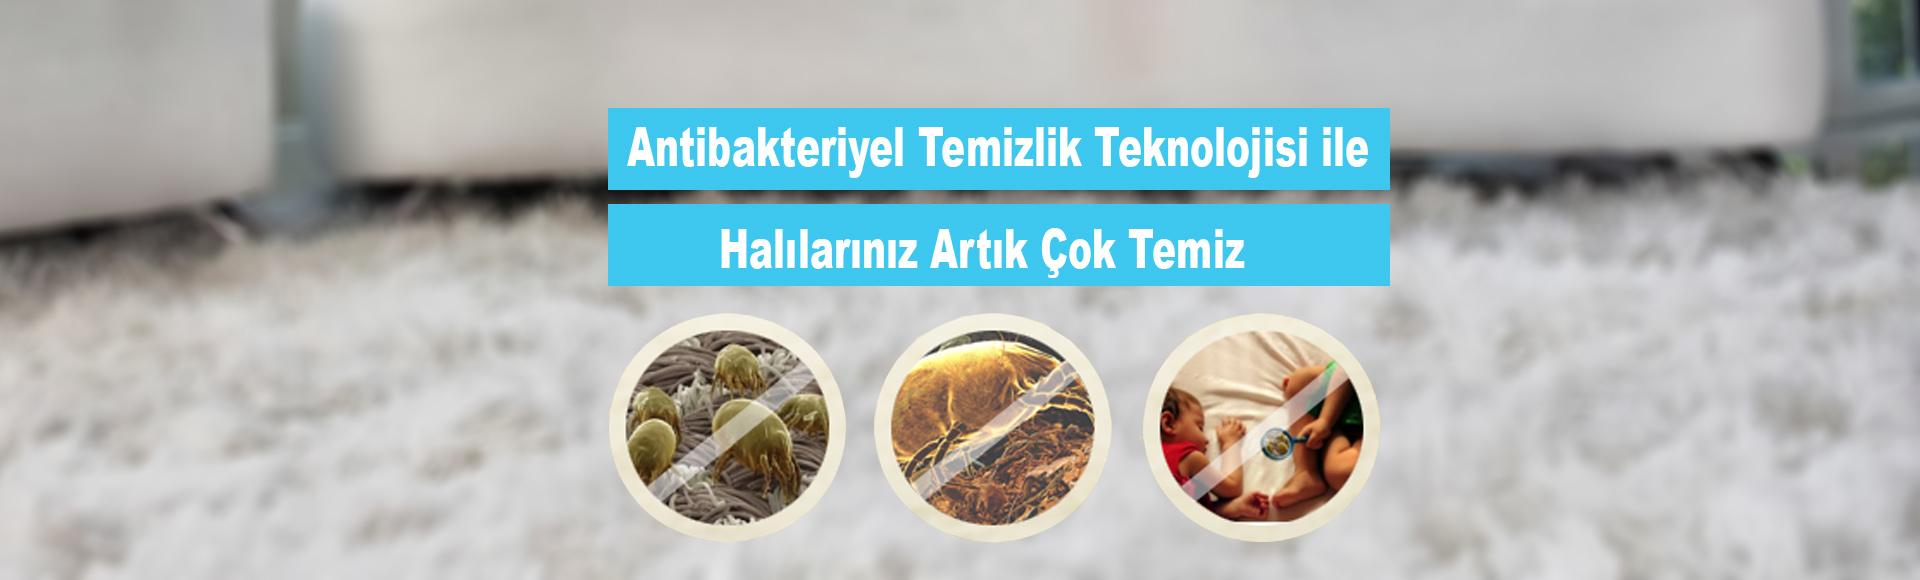 hali-yikama-2